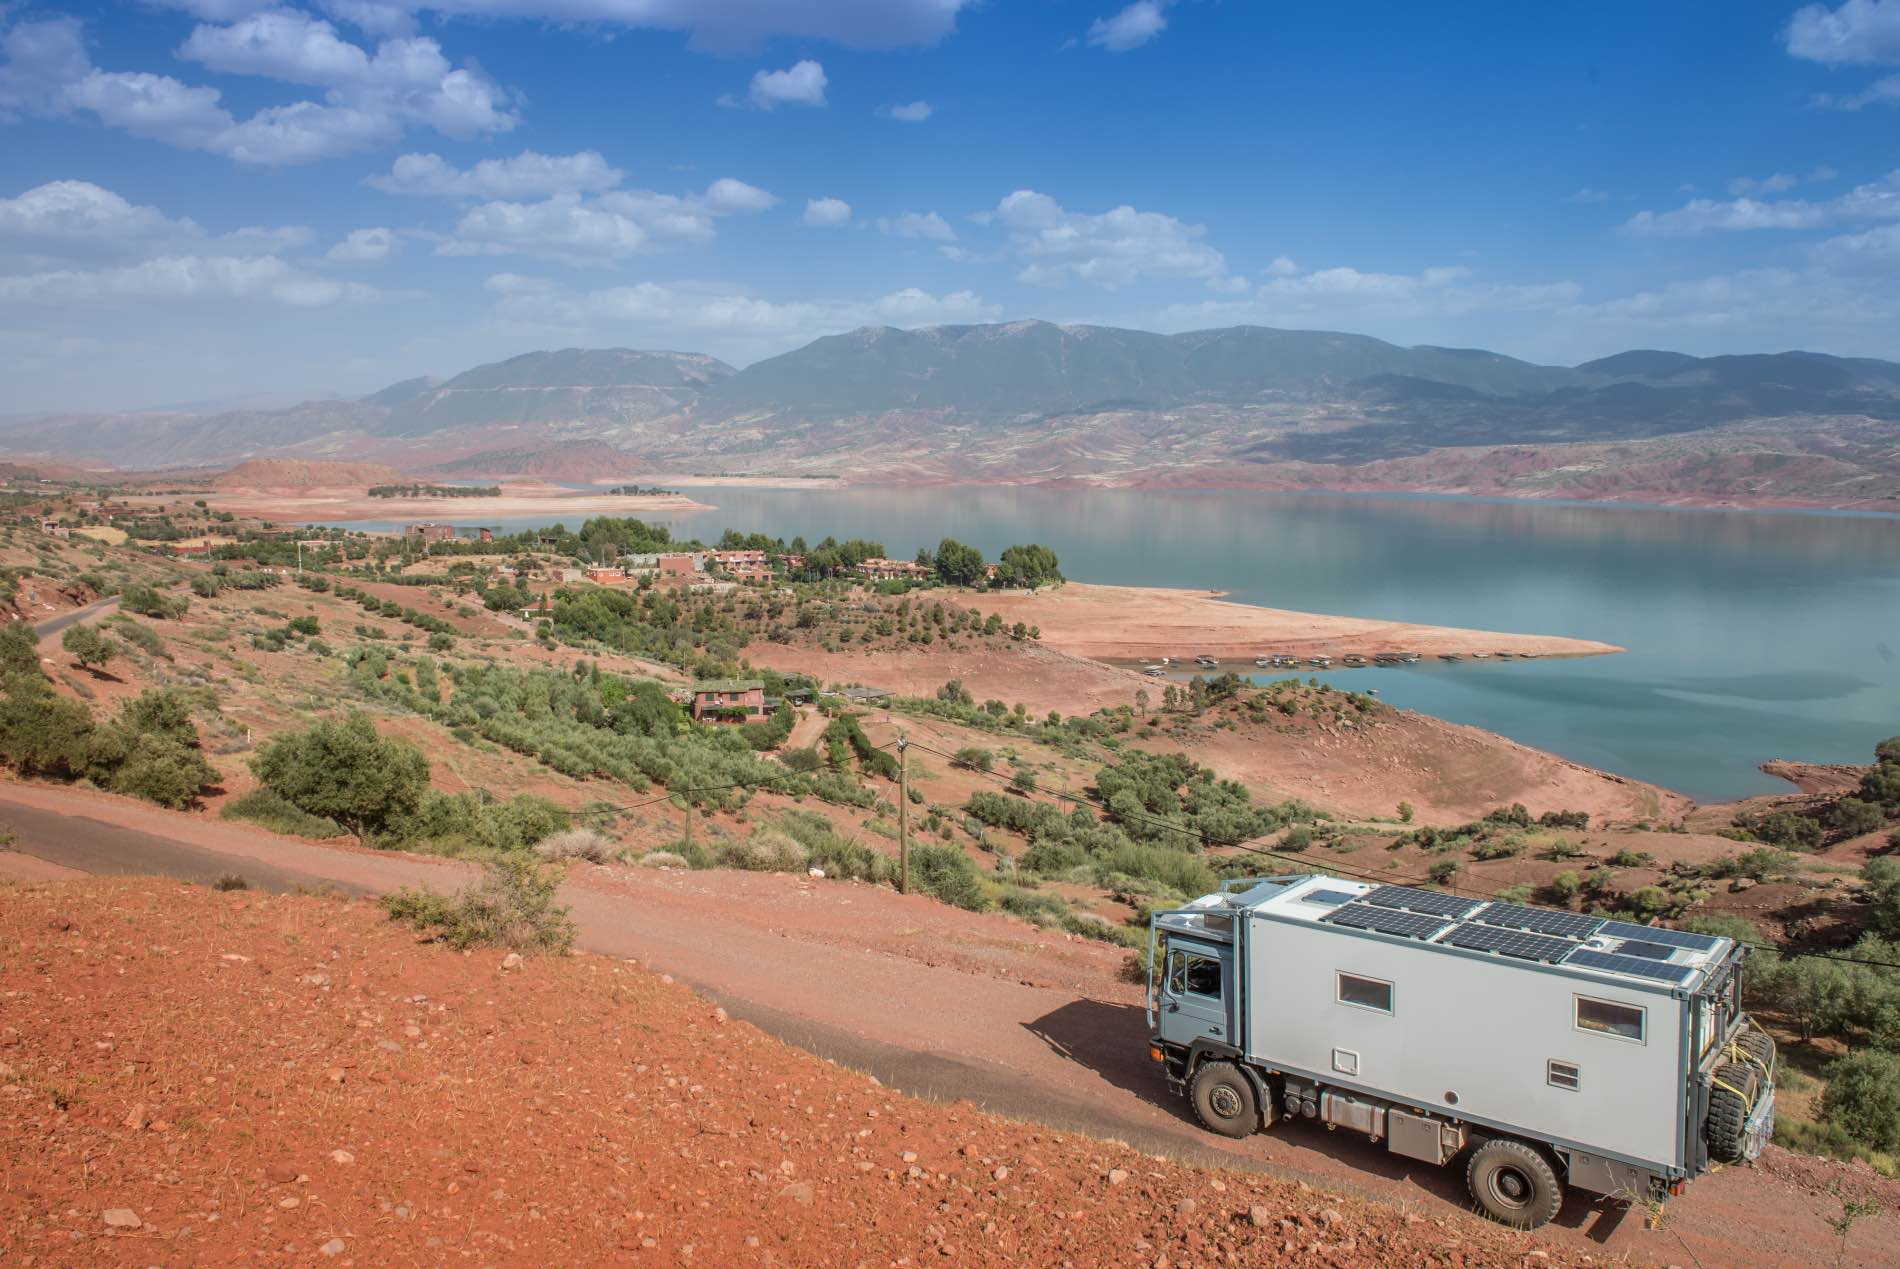 Lago-bin-el-ouidane